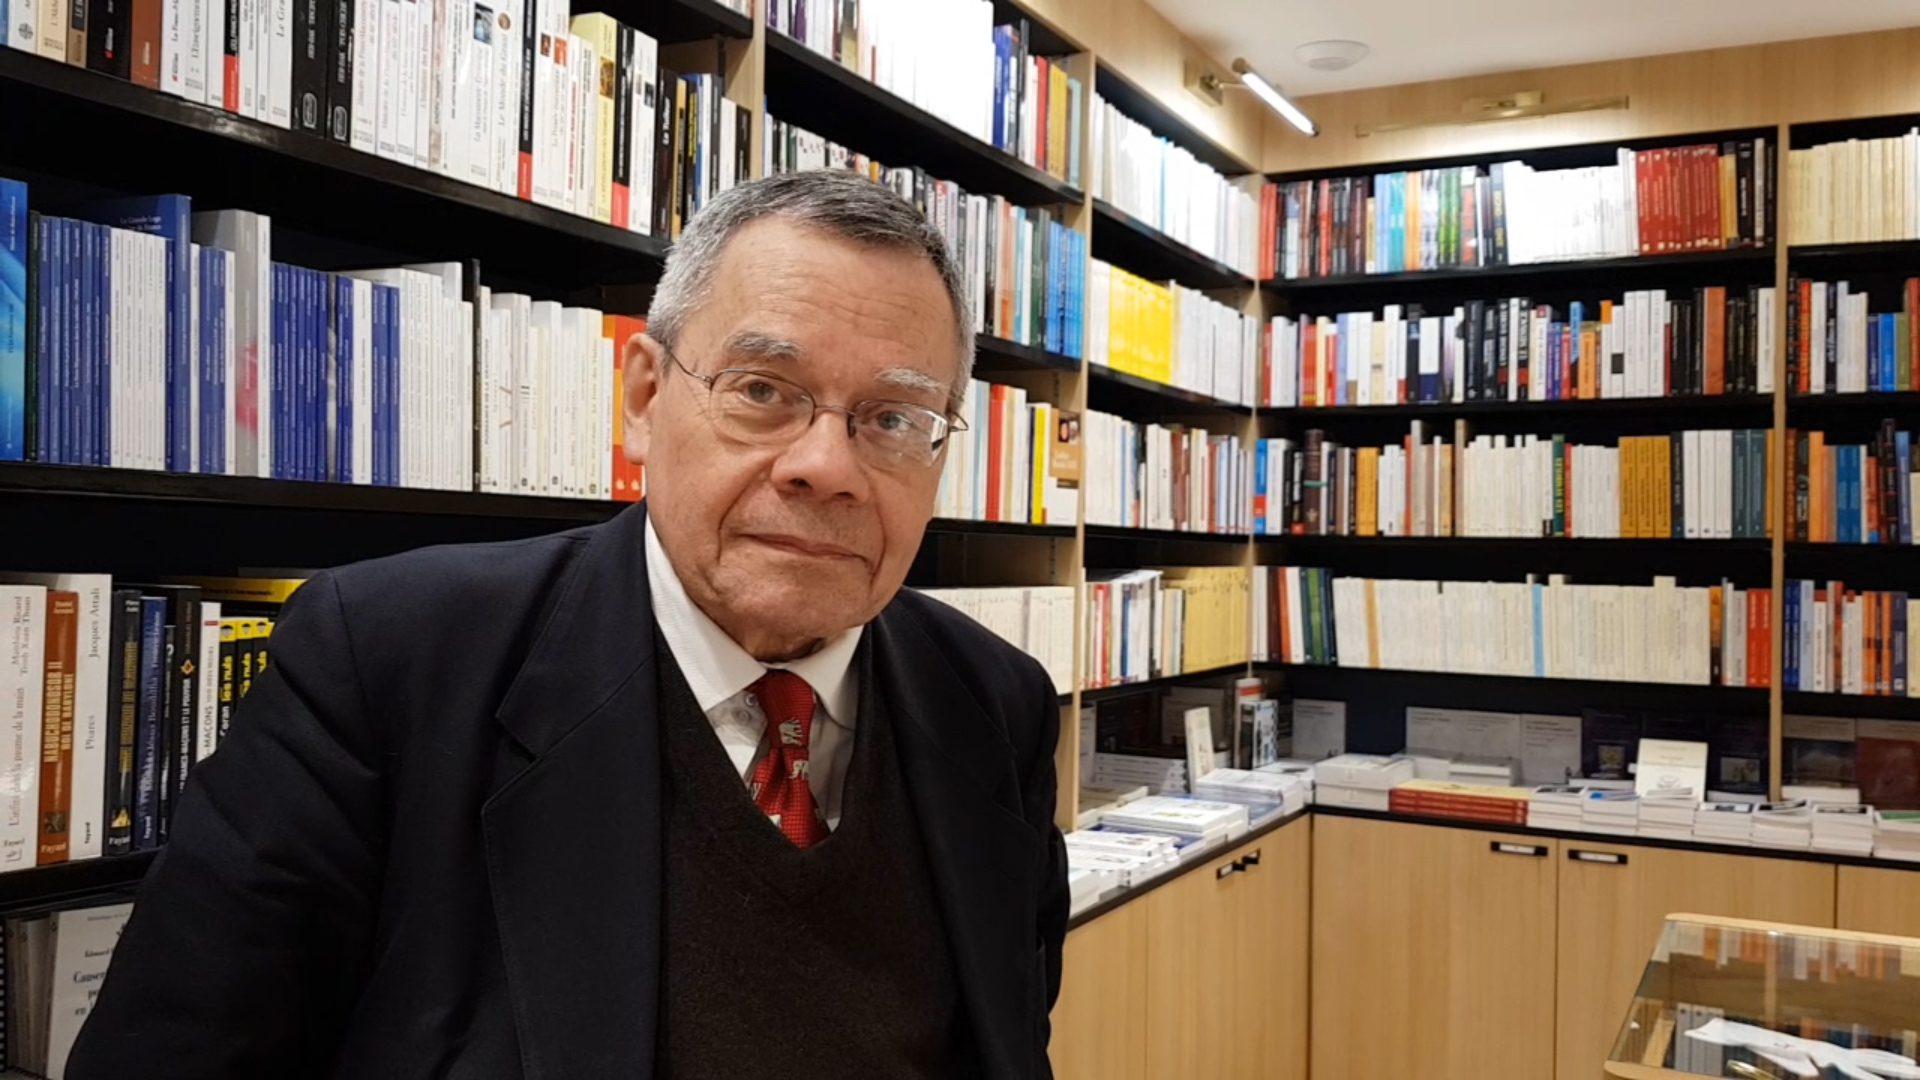 Jean-François Blondel